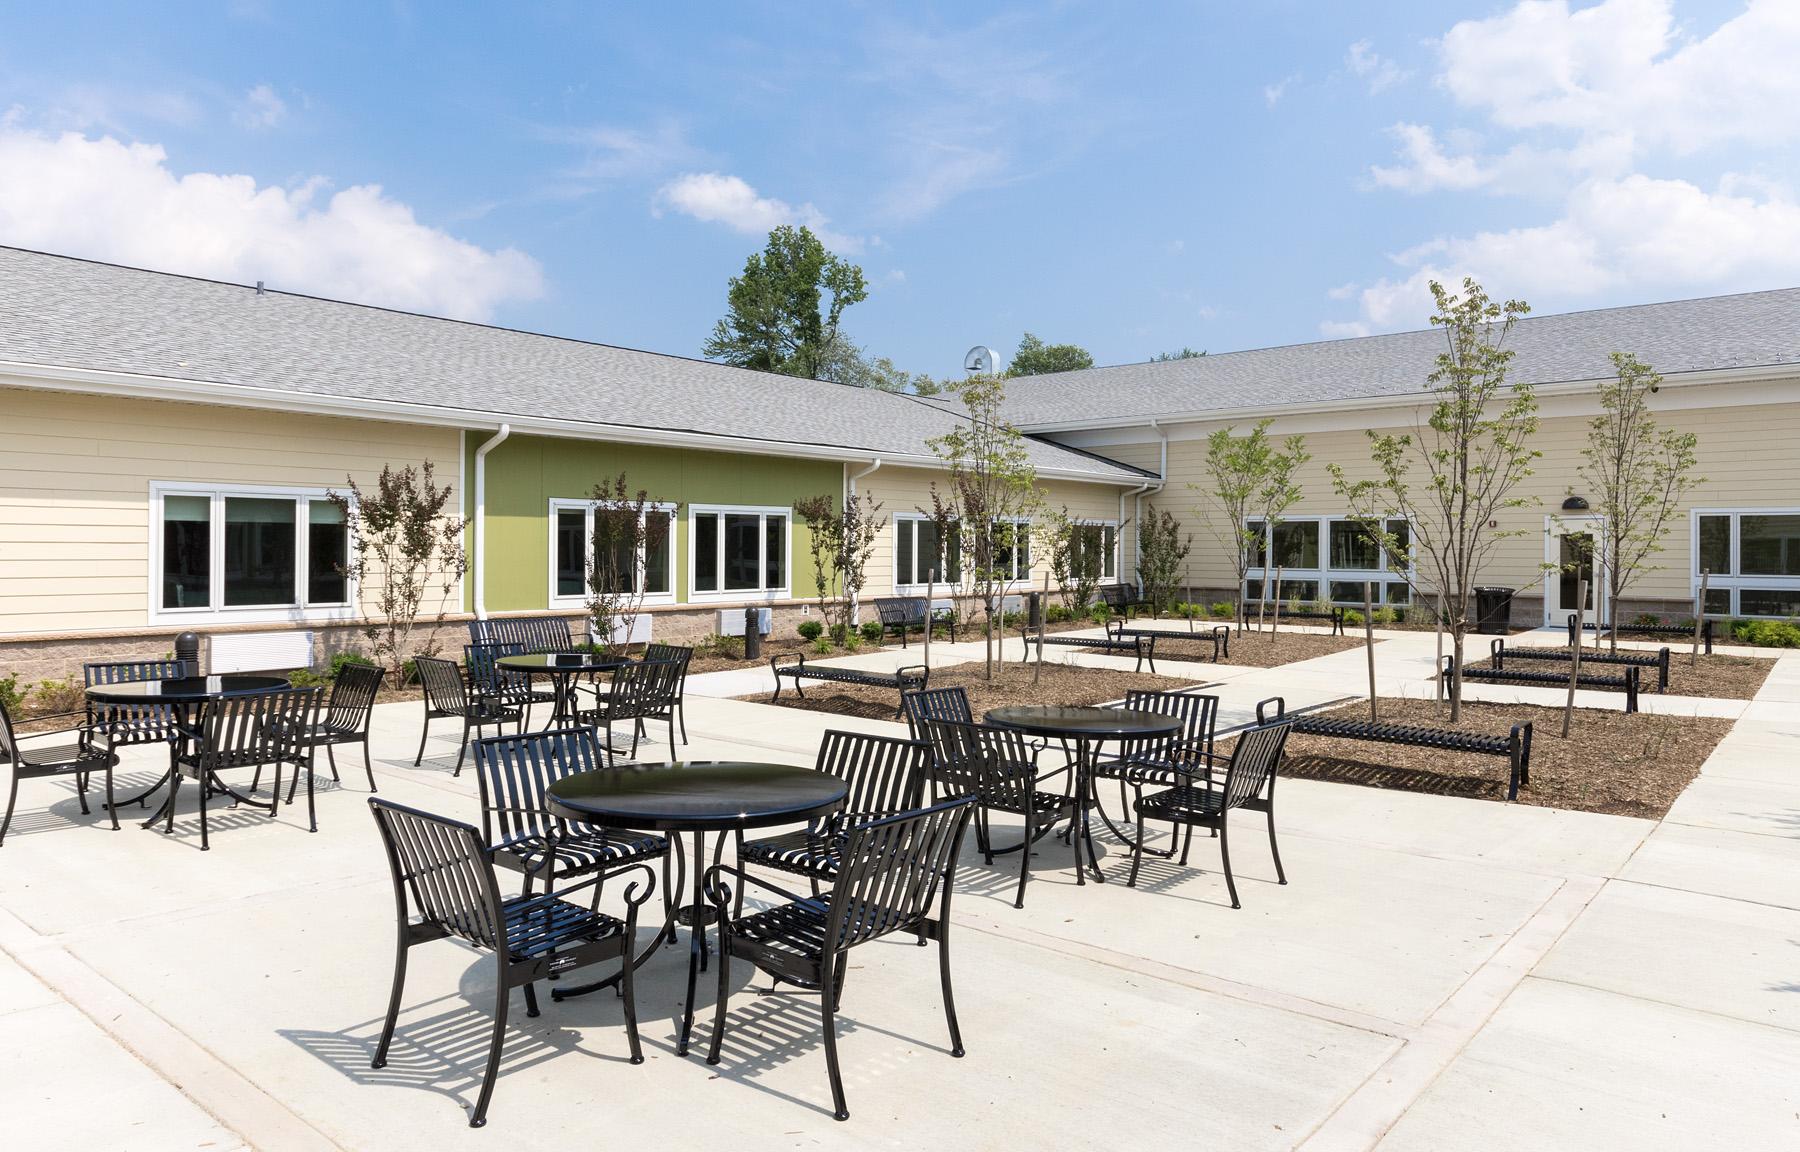 Patio  Doctors Community Rehabilitation and Patient Care Center Lanham, Maryland